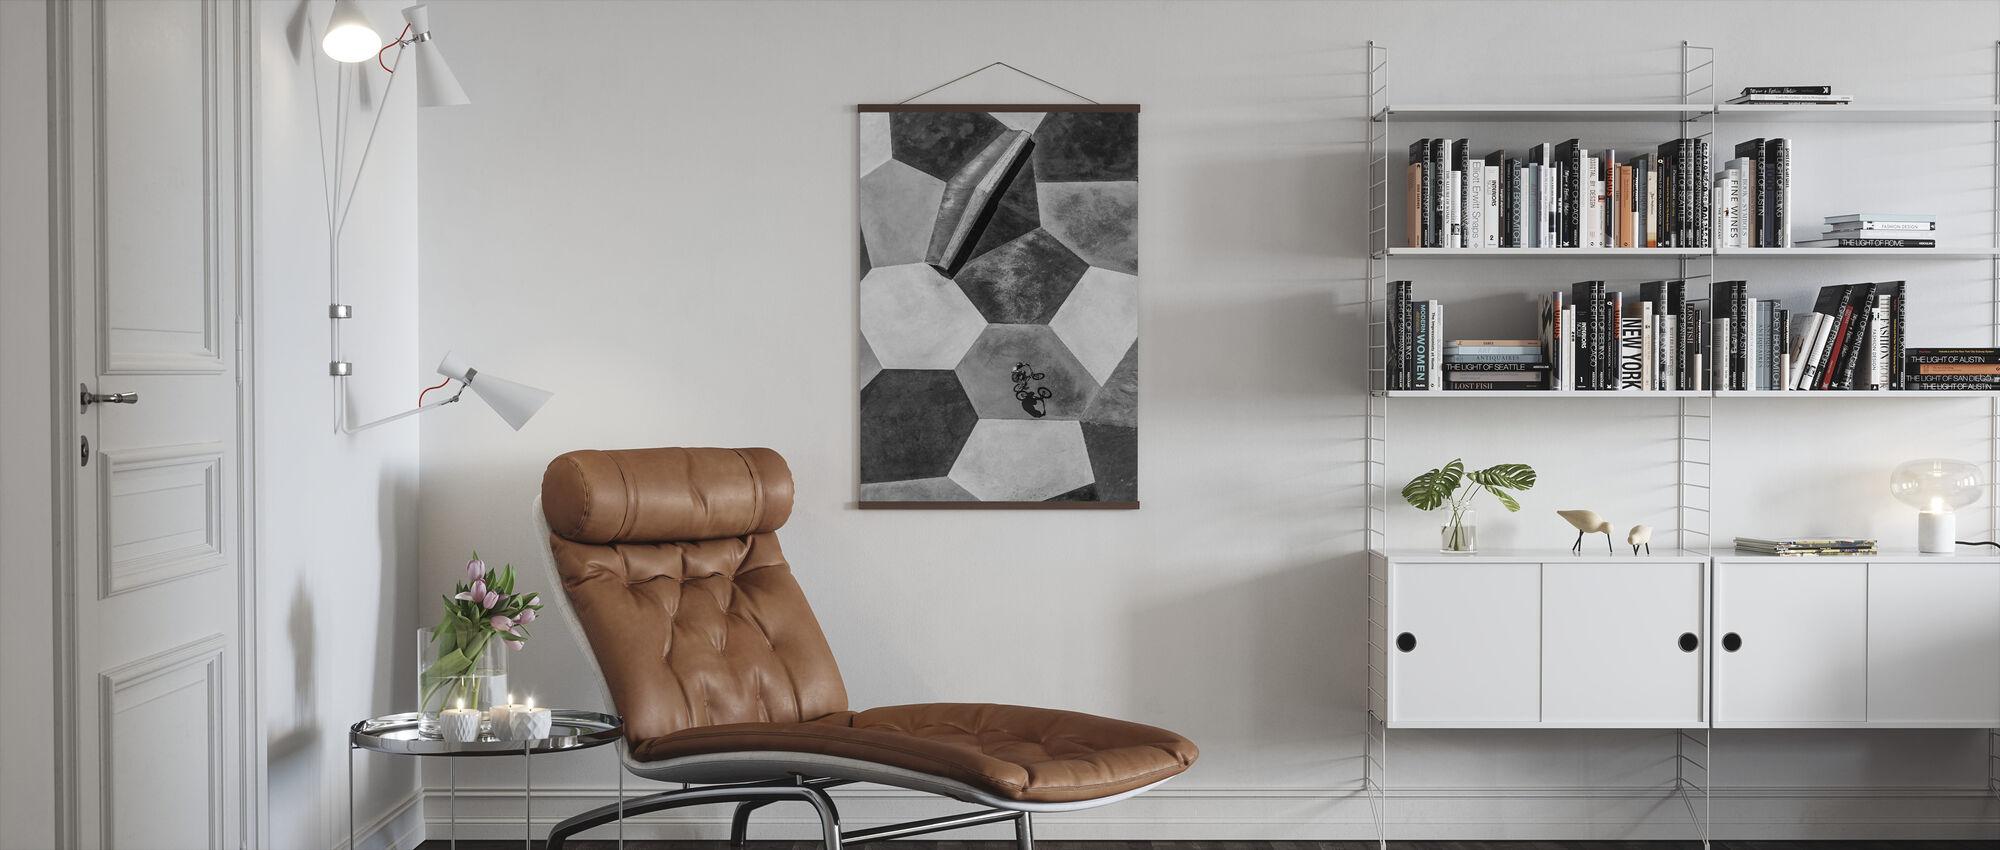 Cavaliere solitario - Poster - Salotto